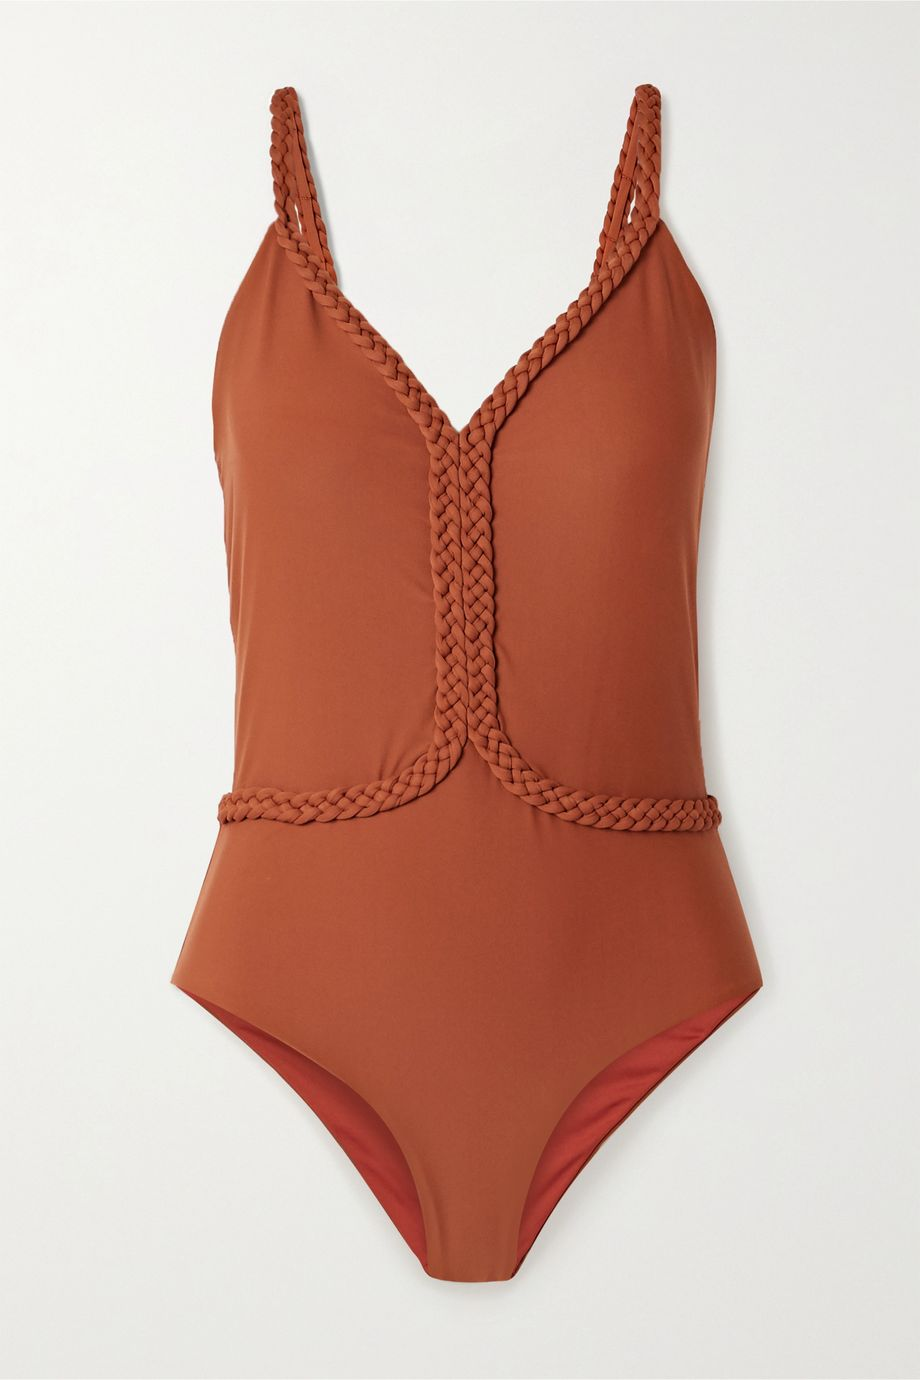 Johanna Ortiz Cape Code braid-trimmed swimsuit